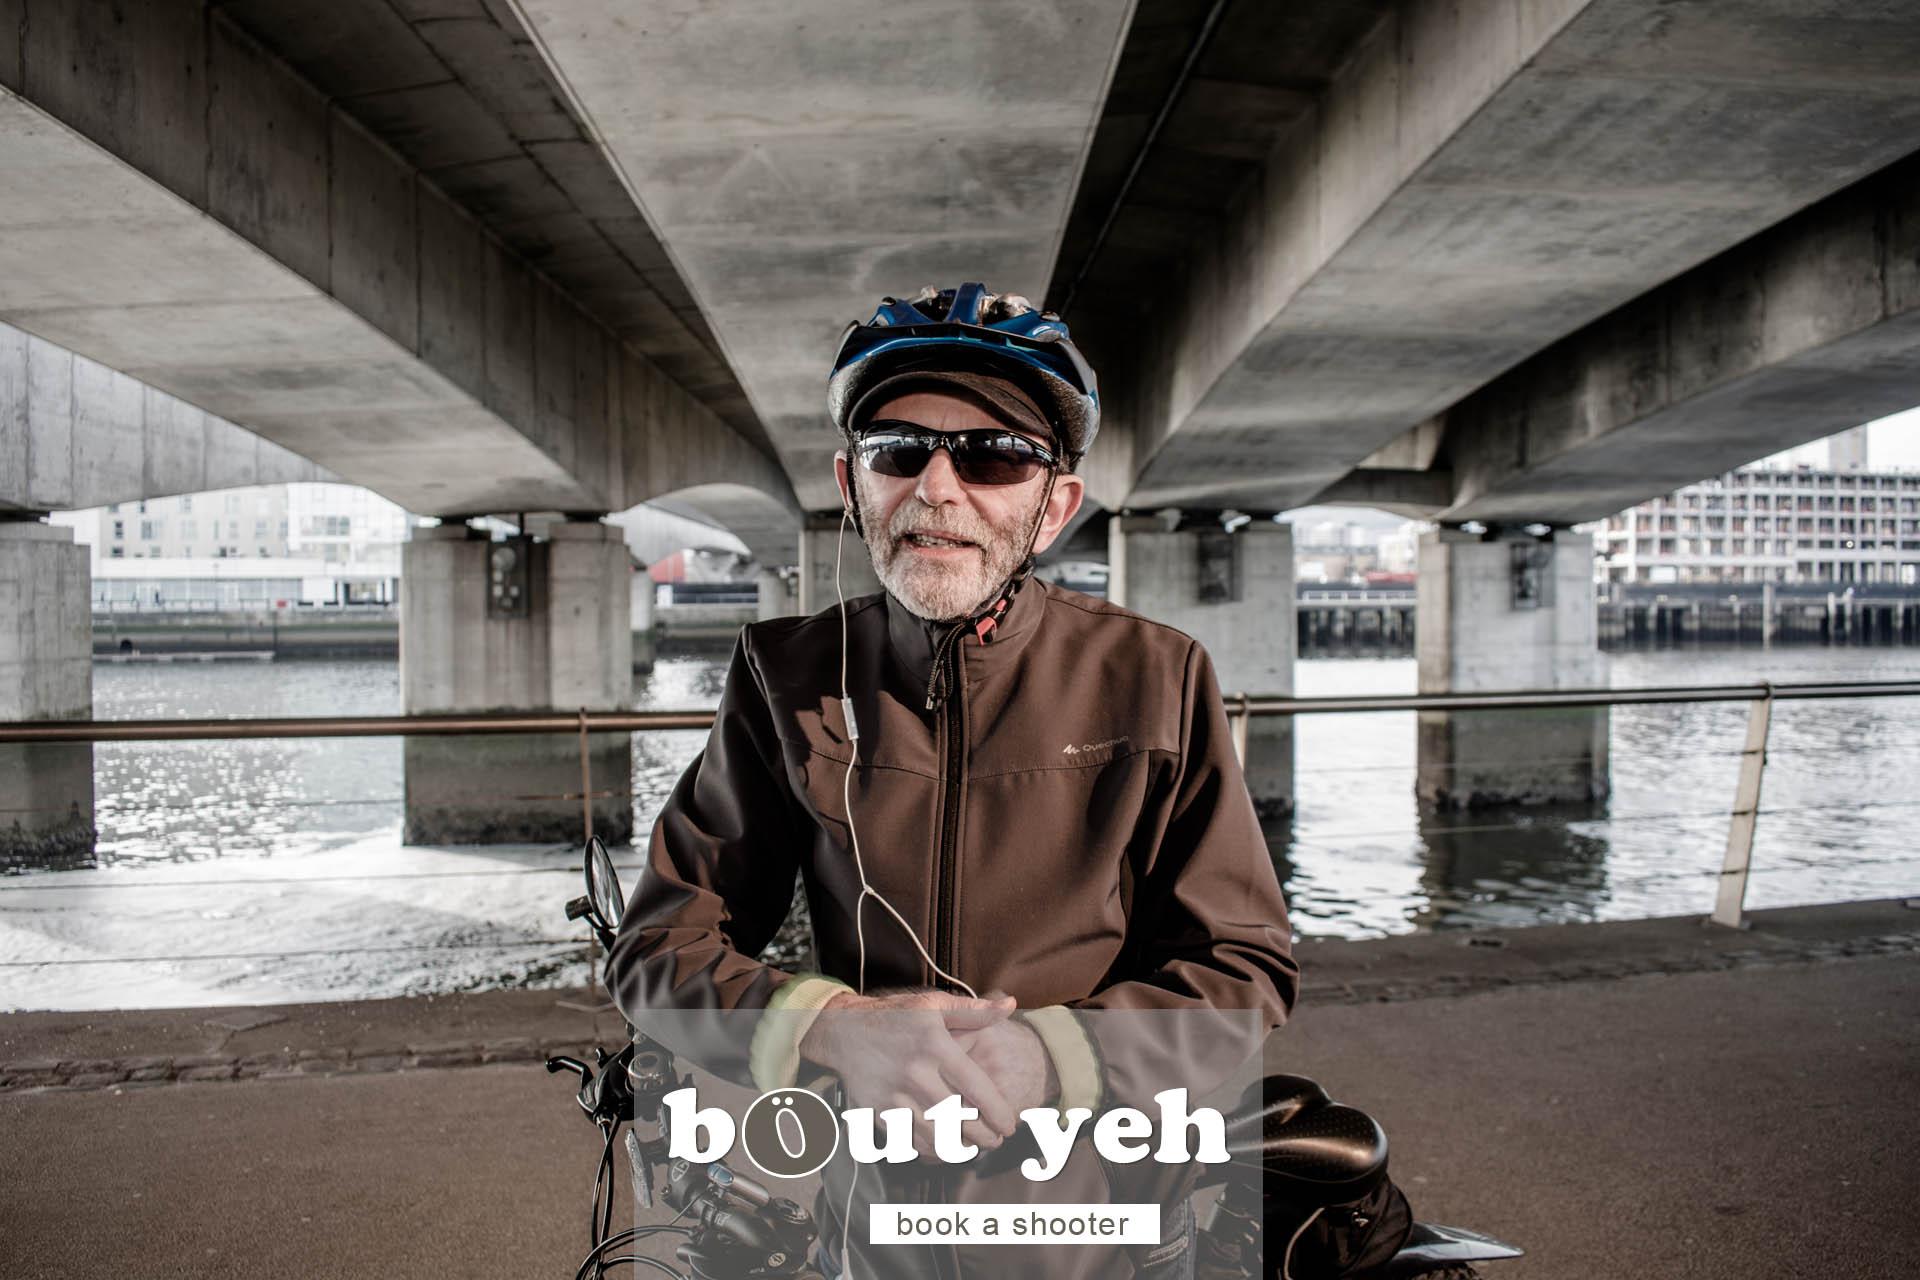 Jerry with bike under Dargan Bridge, Belfast - photo 5055.